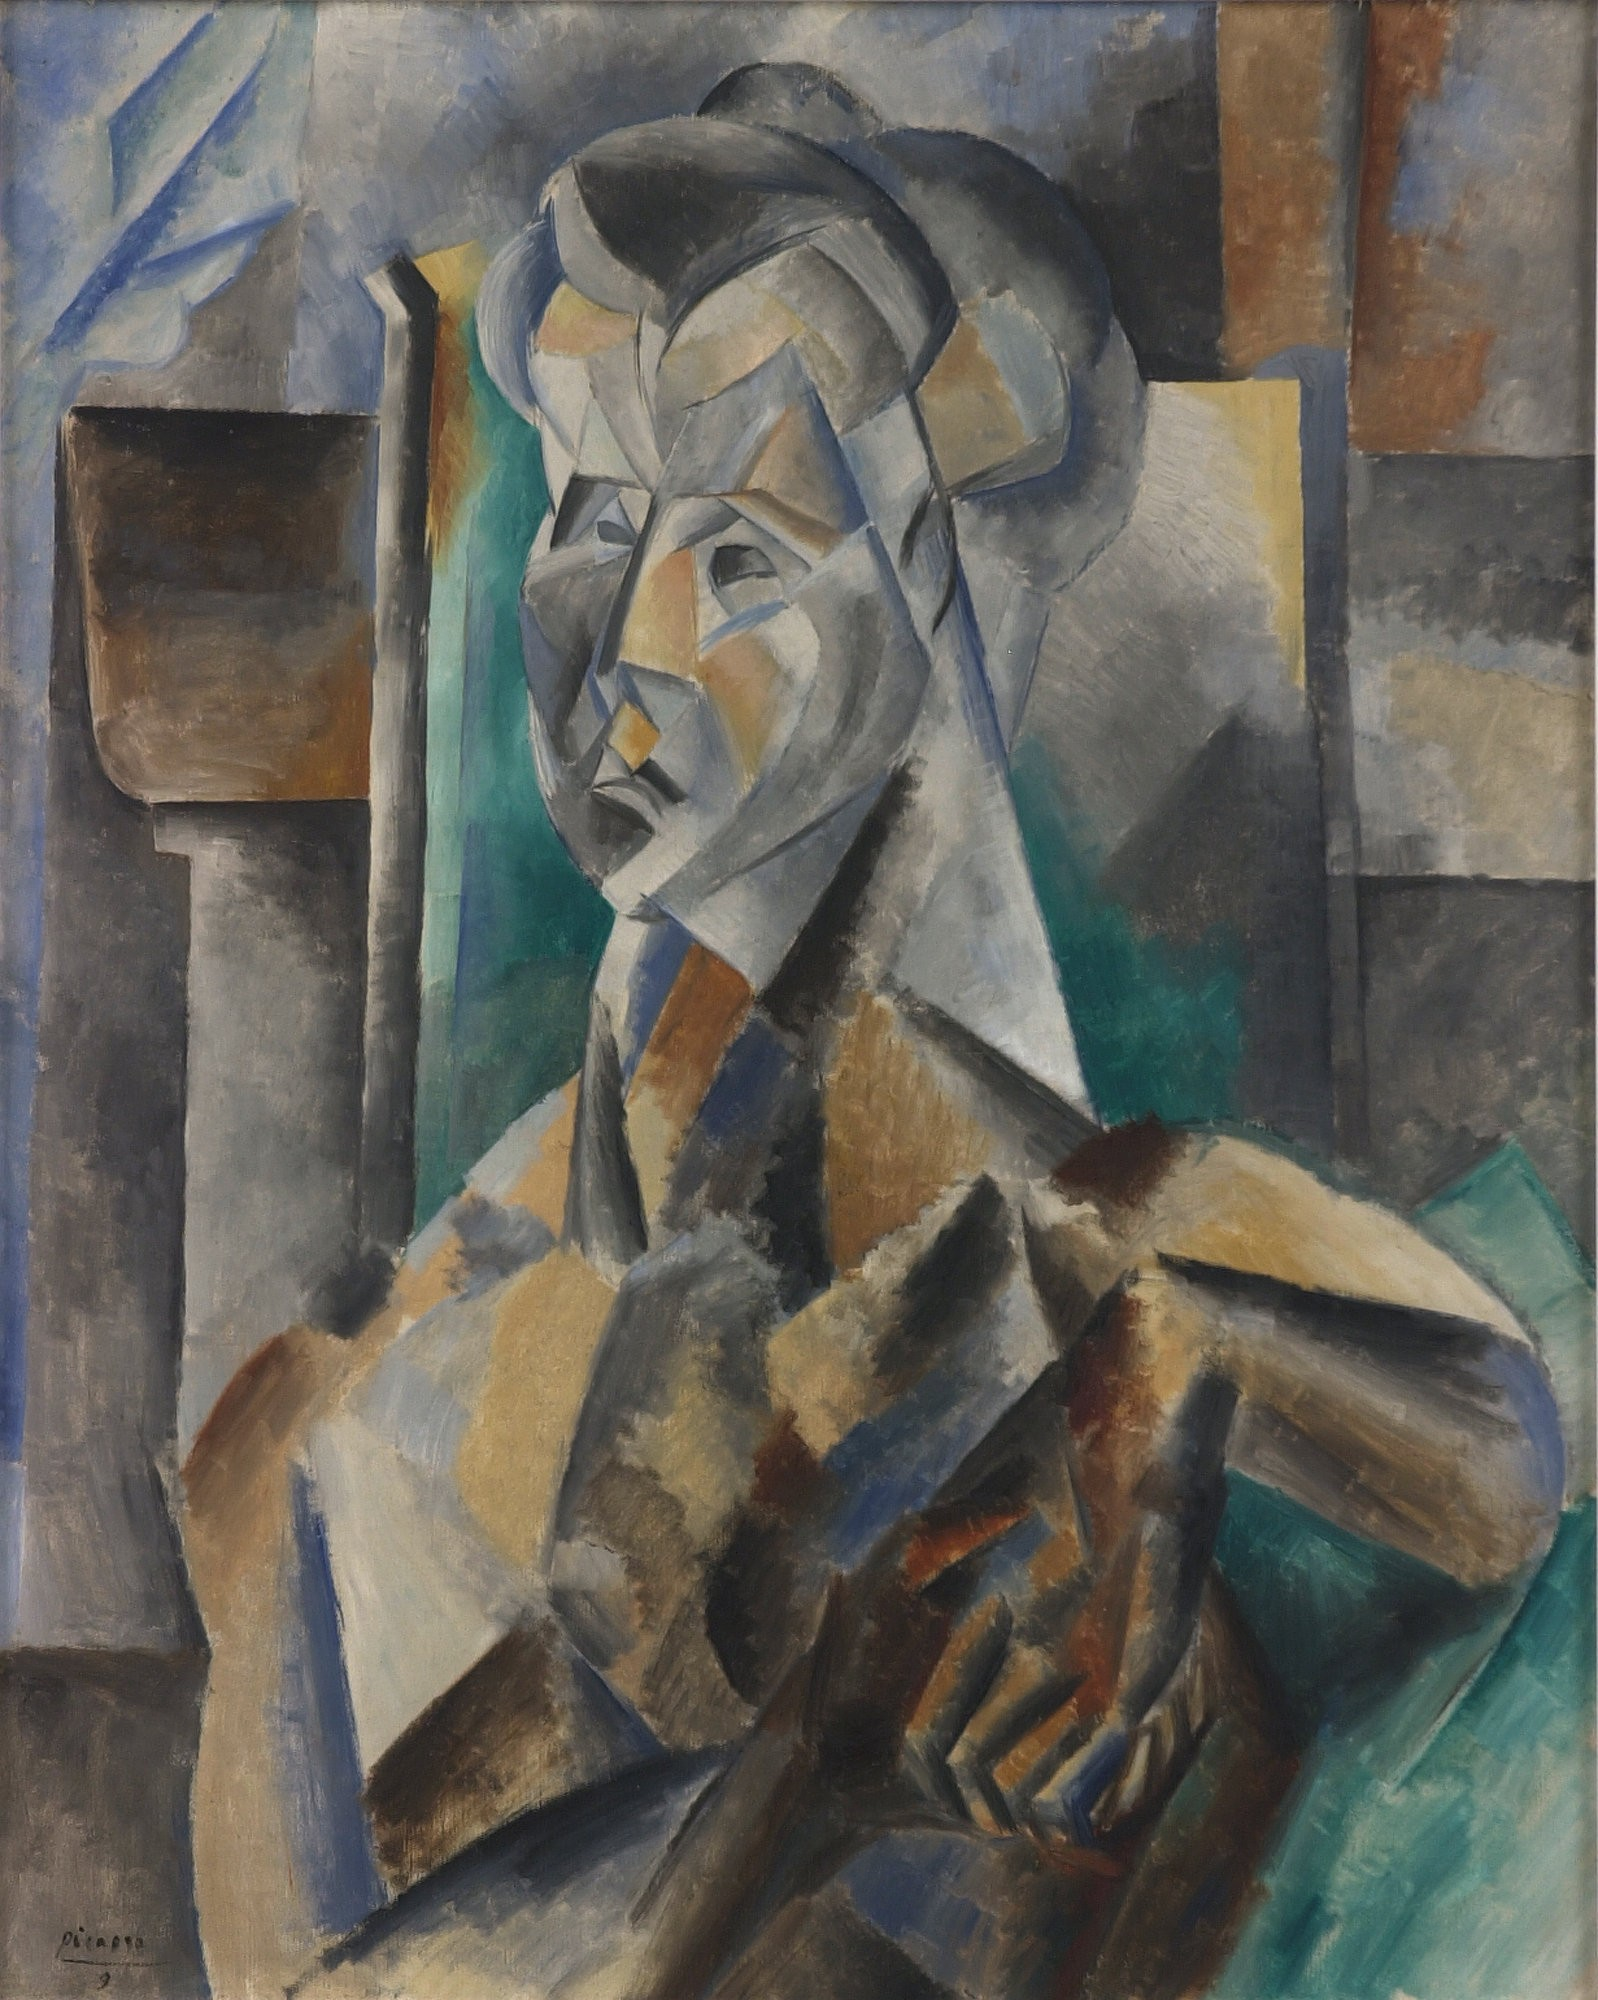 File:Pablo Picasso, 1909, Buste de femme, Femme en vert, Femme ...